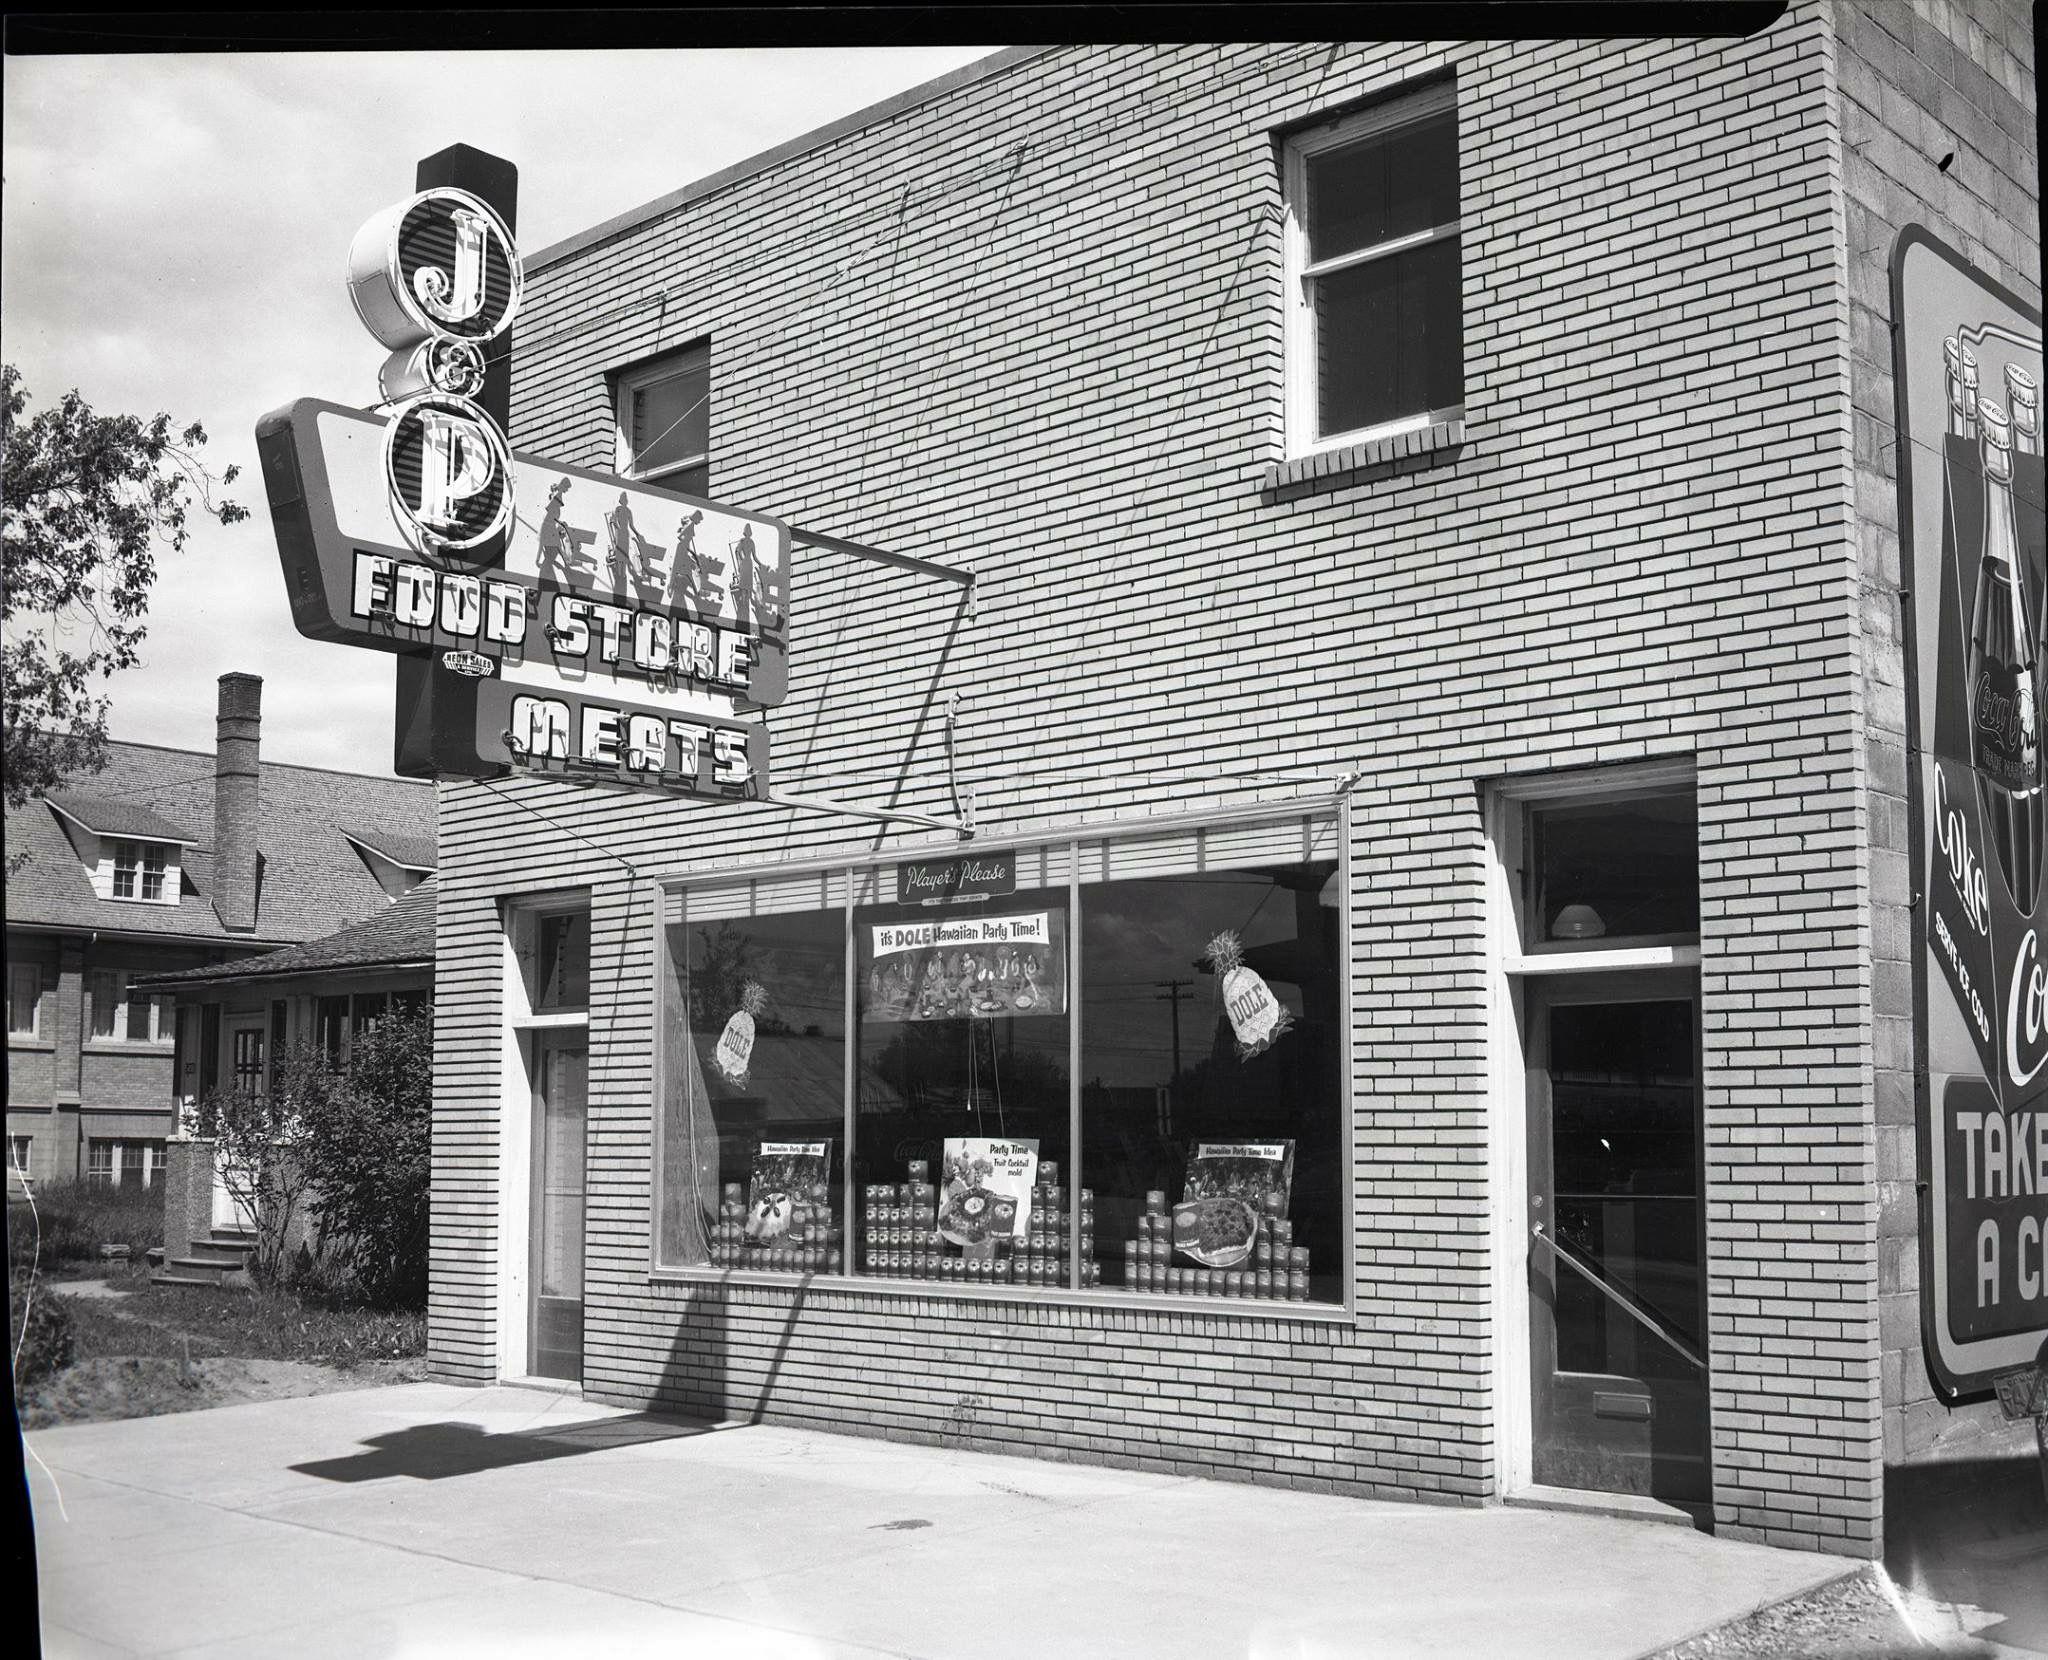 The J&P Food Store at 5405 Gaetz Ave (N of St. Luke's